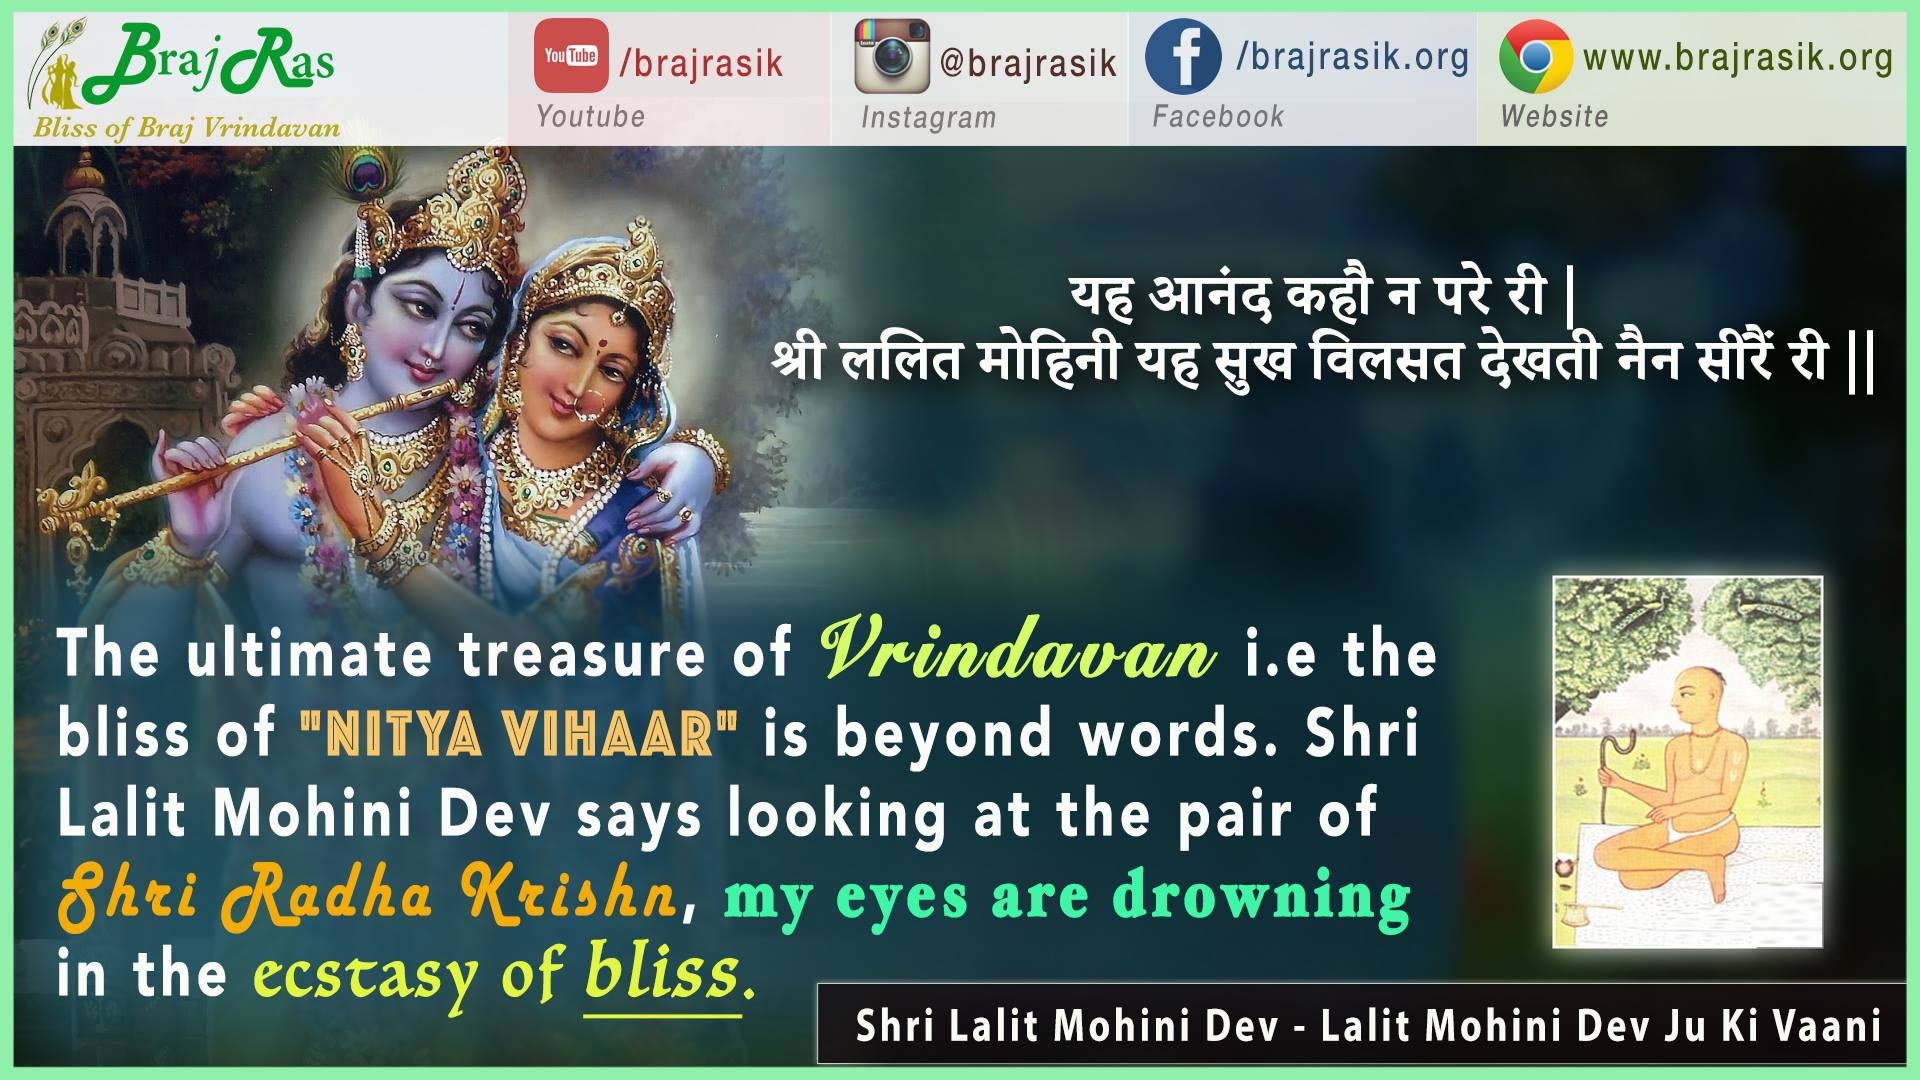 Yeh Anand Kaho Na Pare Ri - Shri Lalit Mohini Dev